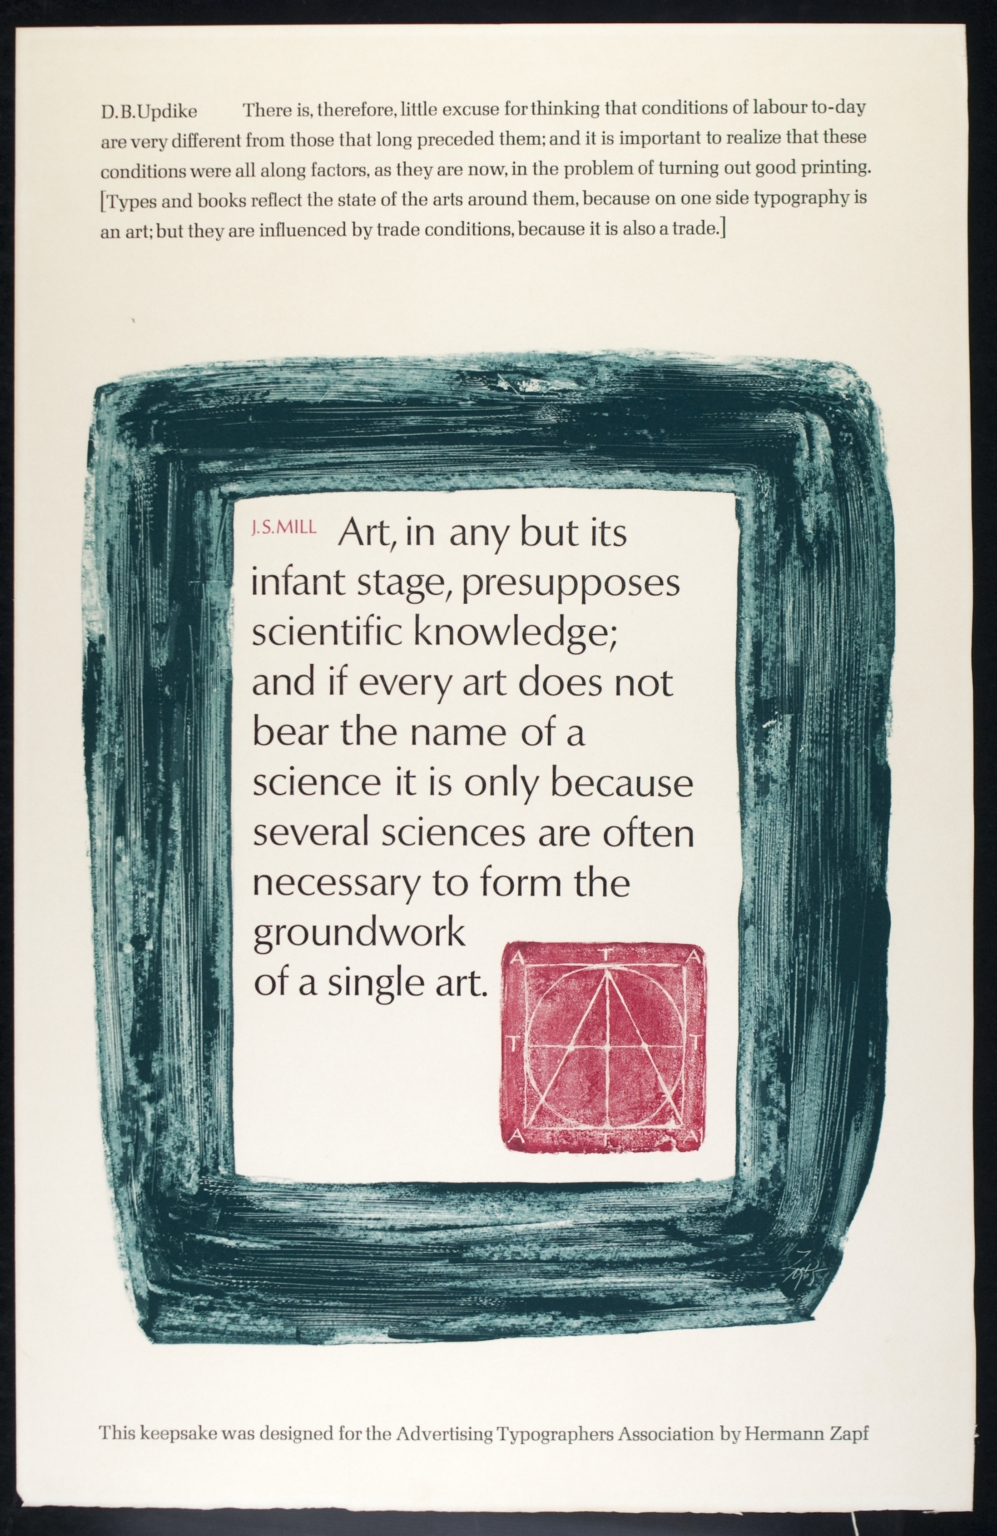 Advertising Typographers Association keepsake